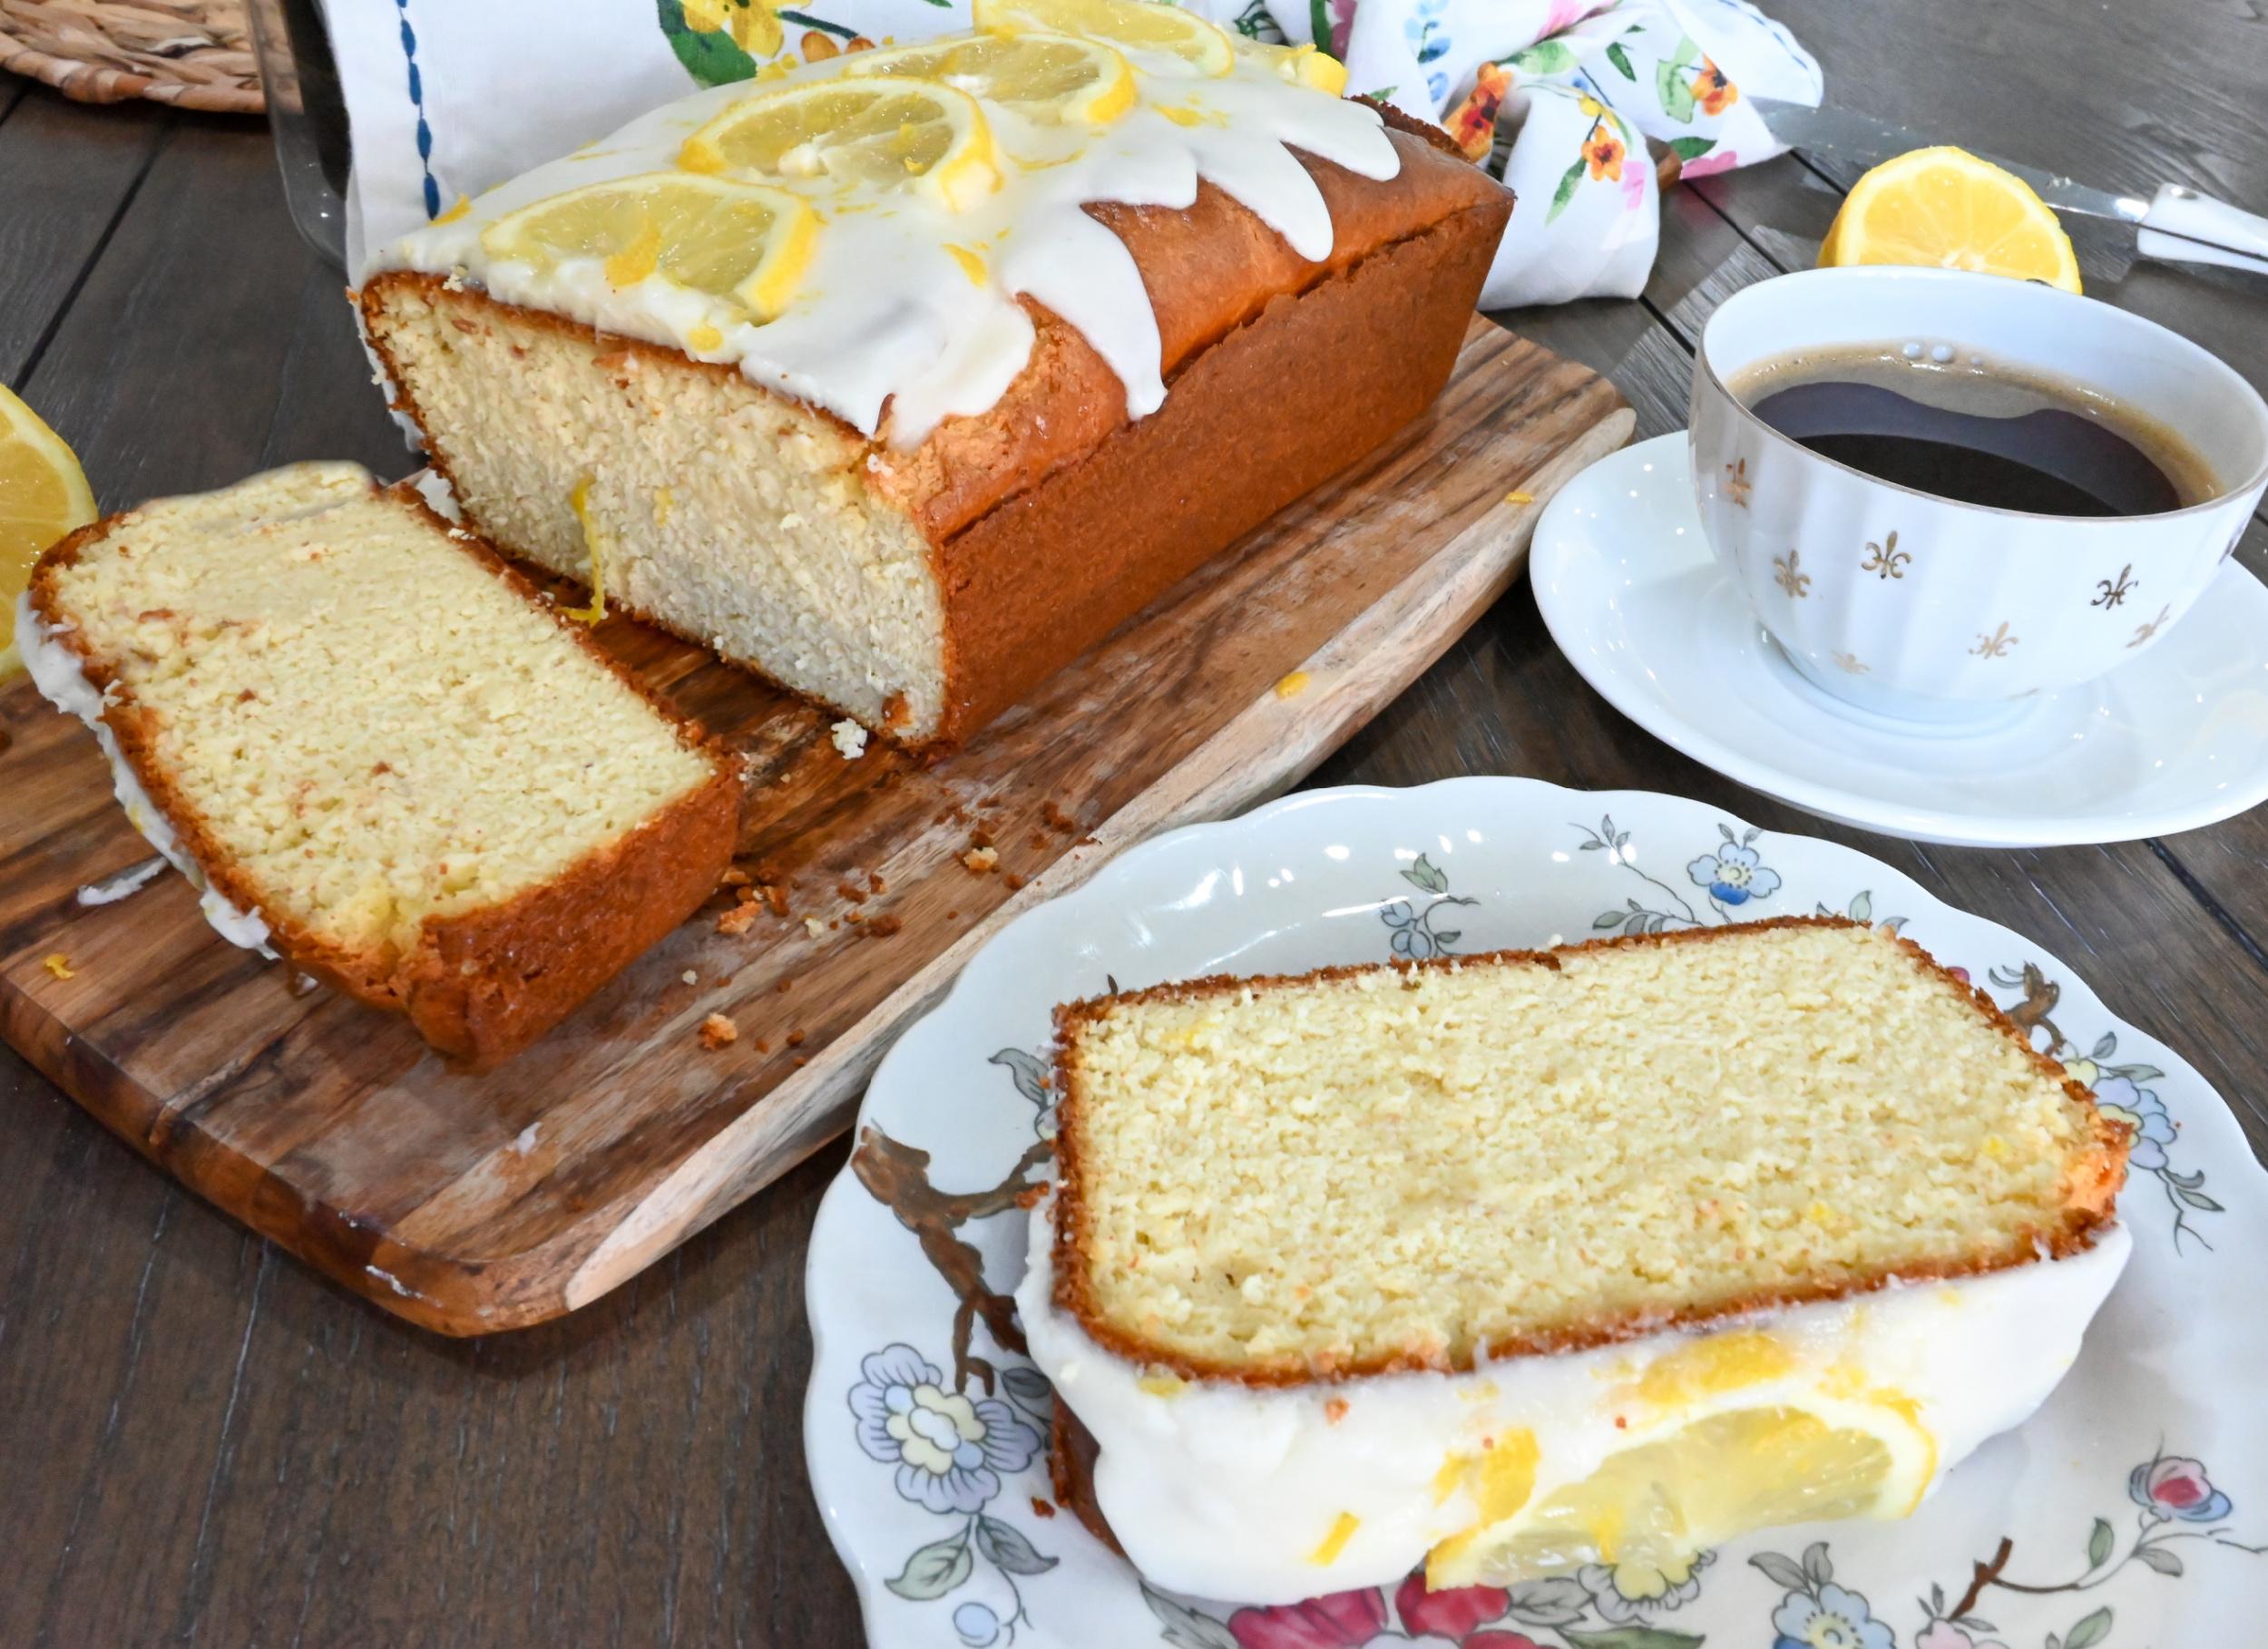 keto lemon pound cake sliced and served on fine china